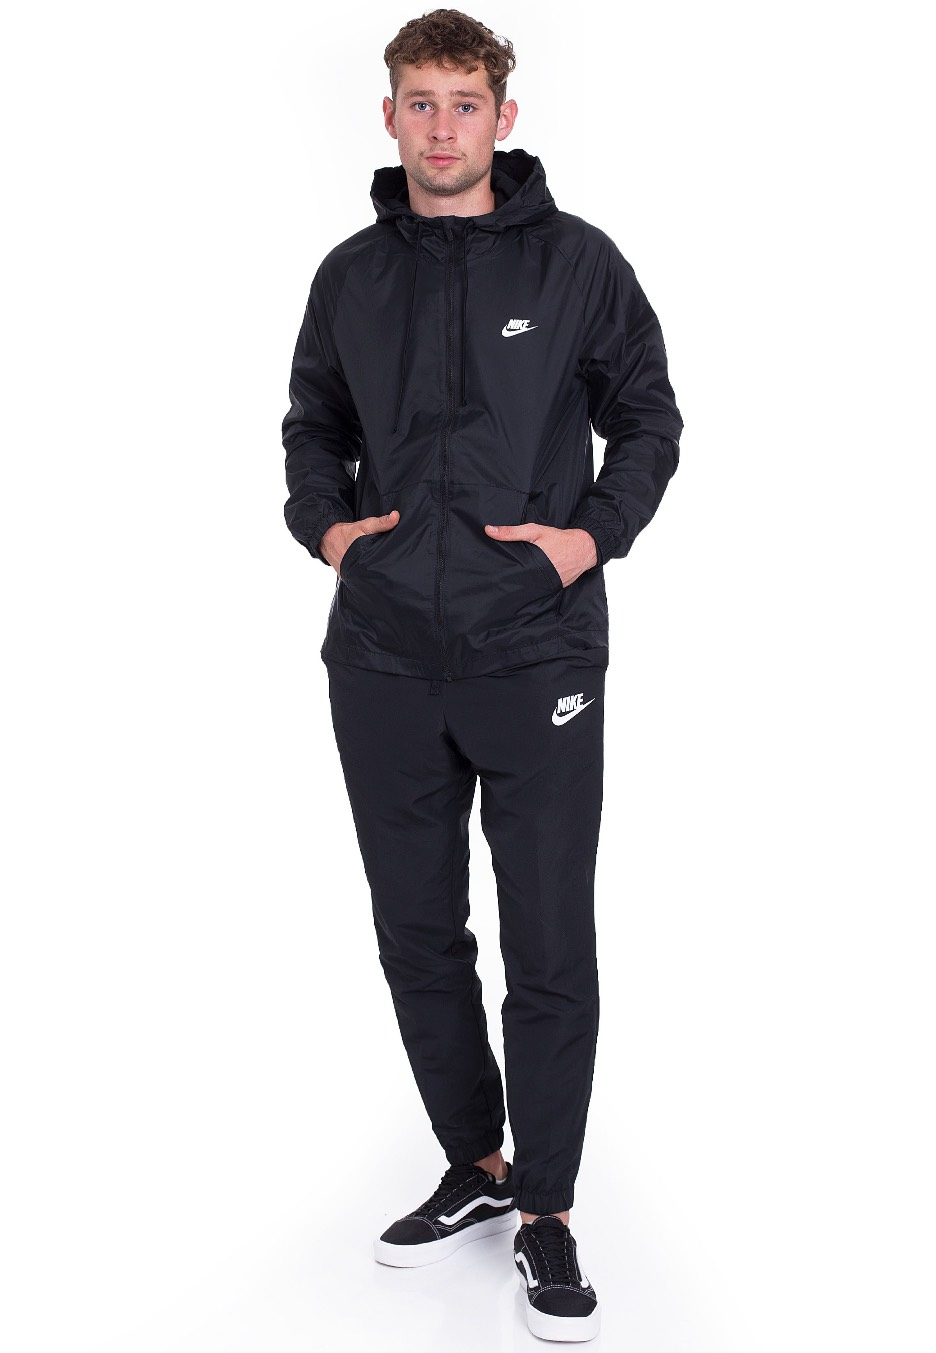 297519929f63 Nike - Sportswear Black Black White - Tracksuit - Streetwear Shop -  Impericon.com UK